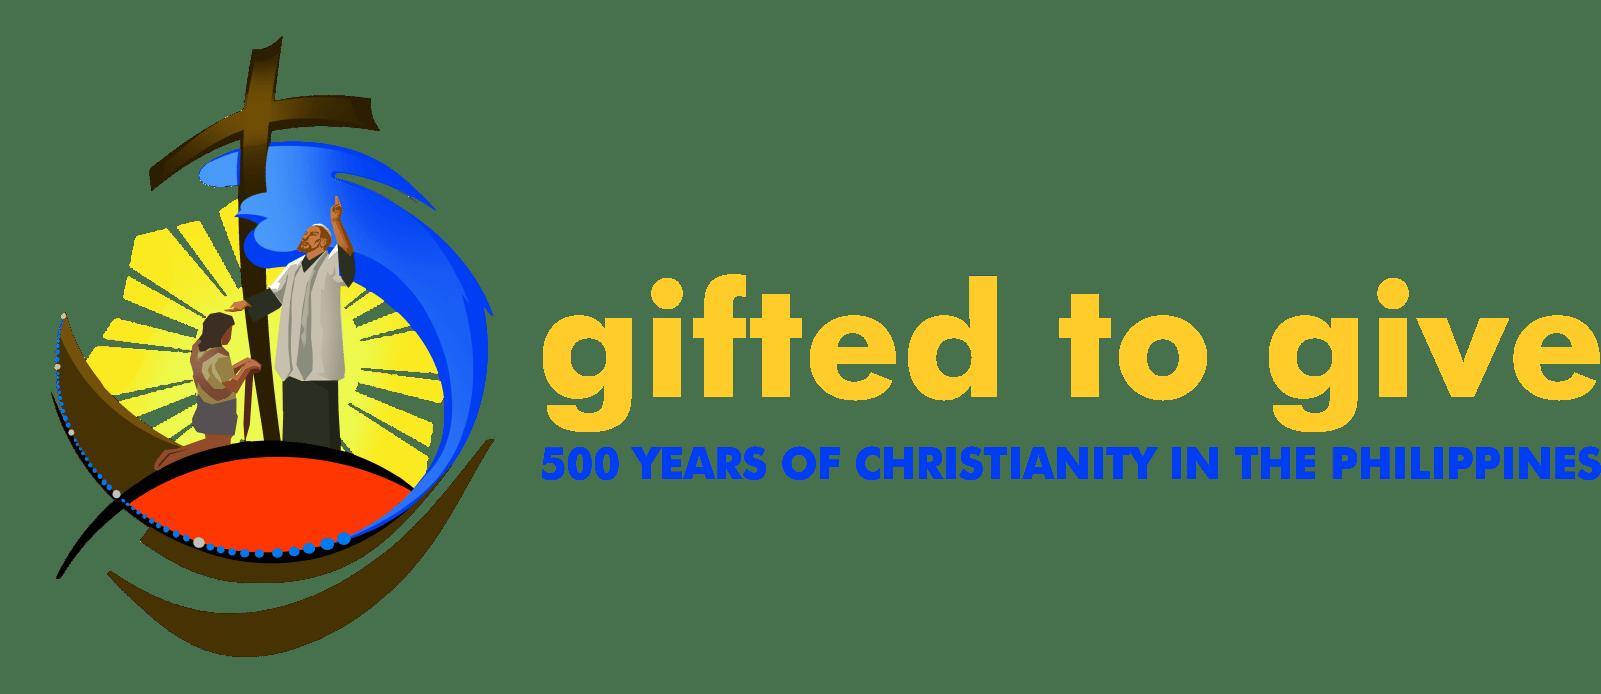 500 Years of Christianity - Cebu